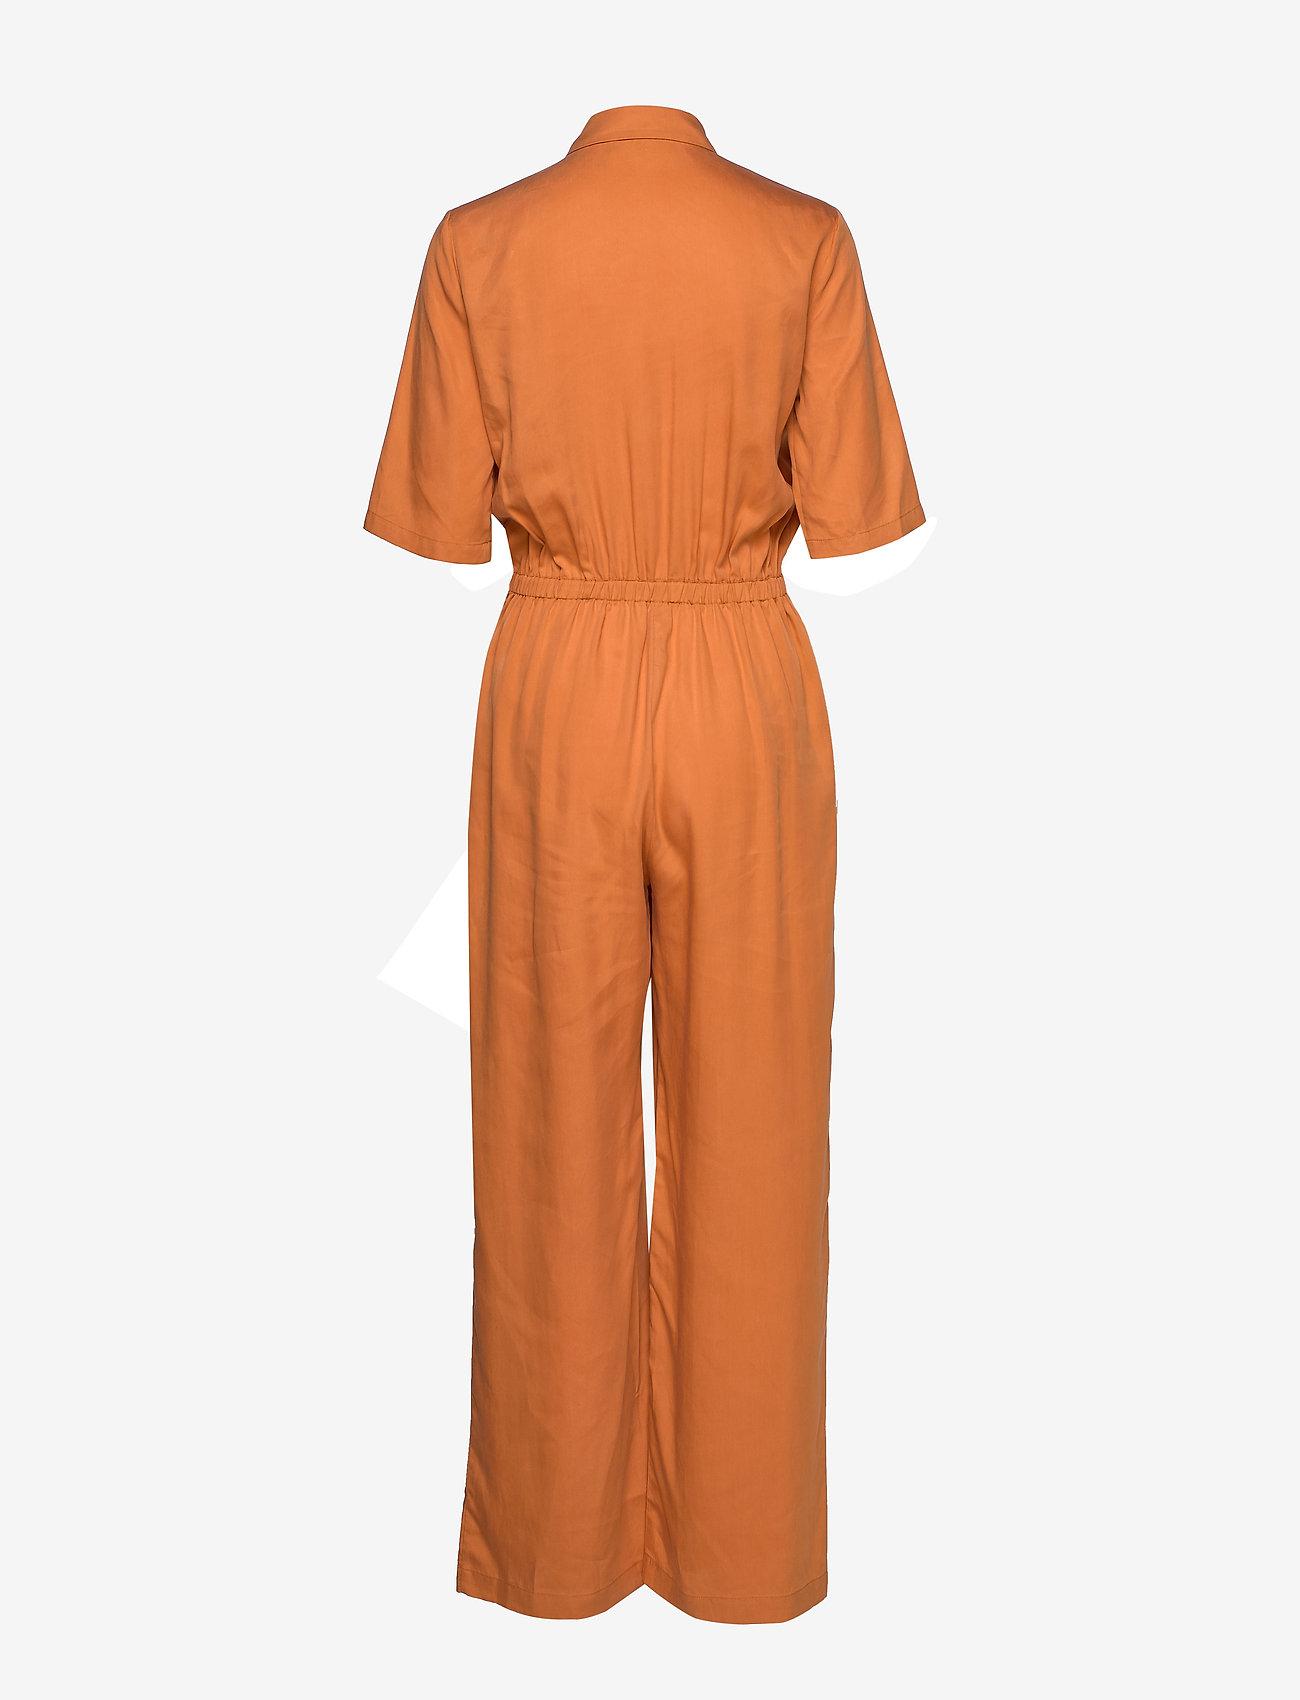 Storm & Marie Debora Jumpsuit - Jumpsuits 851 PEACH - Damen Kleidung